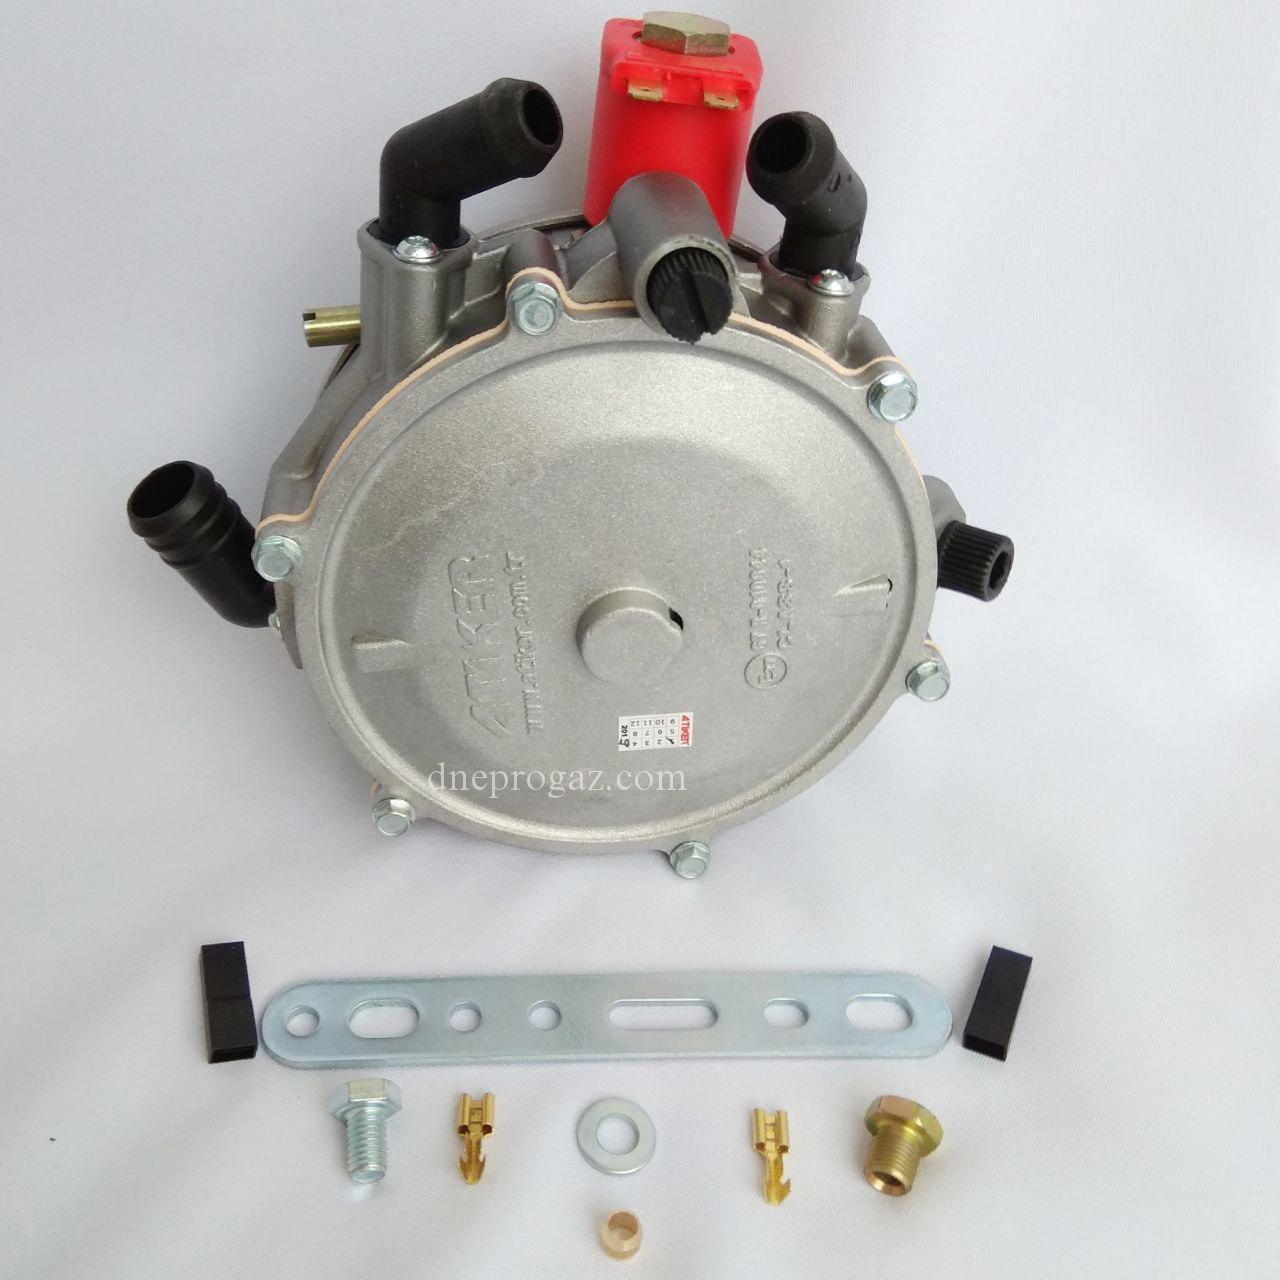 Электронный редуктор Atiker VR01 до 90 kW (120 л.с.)(Гарантия 2 года)